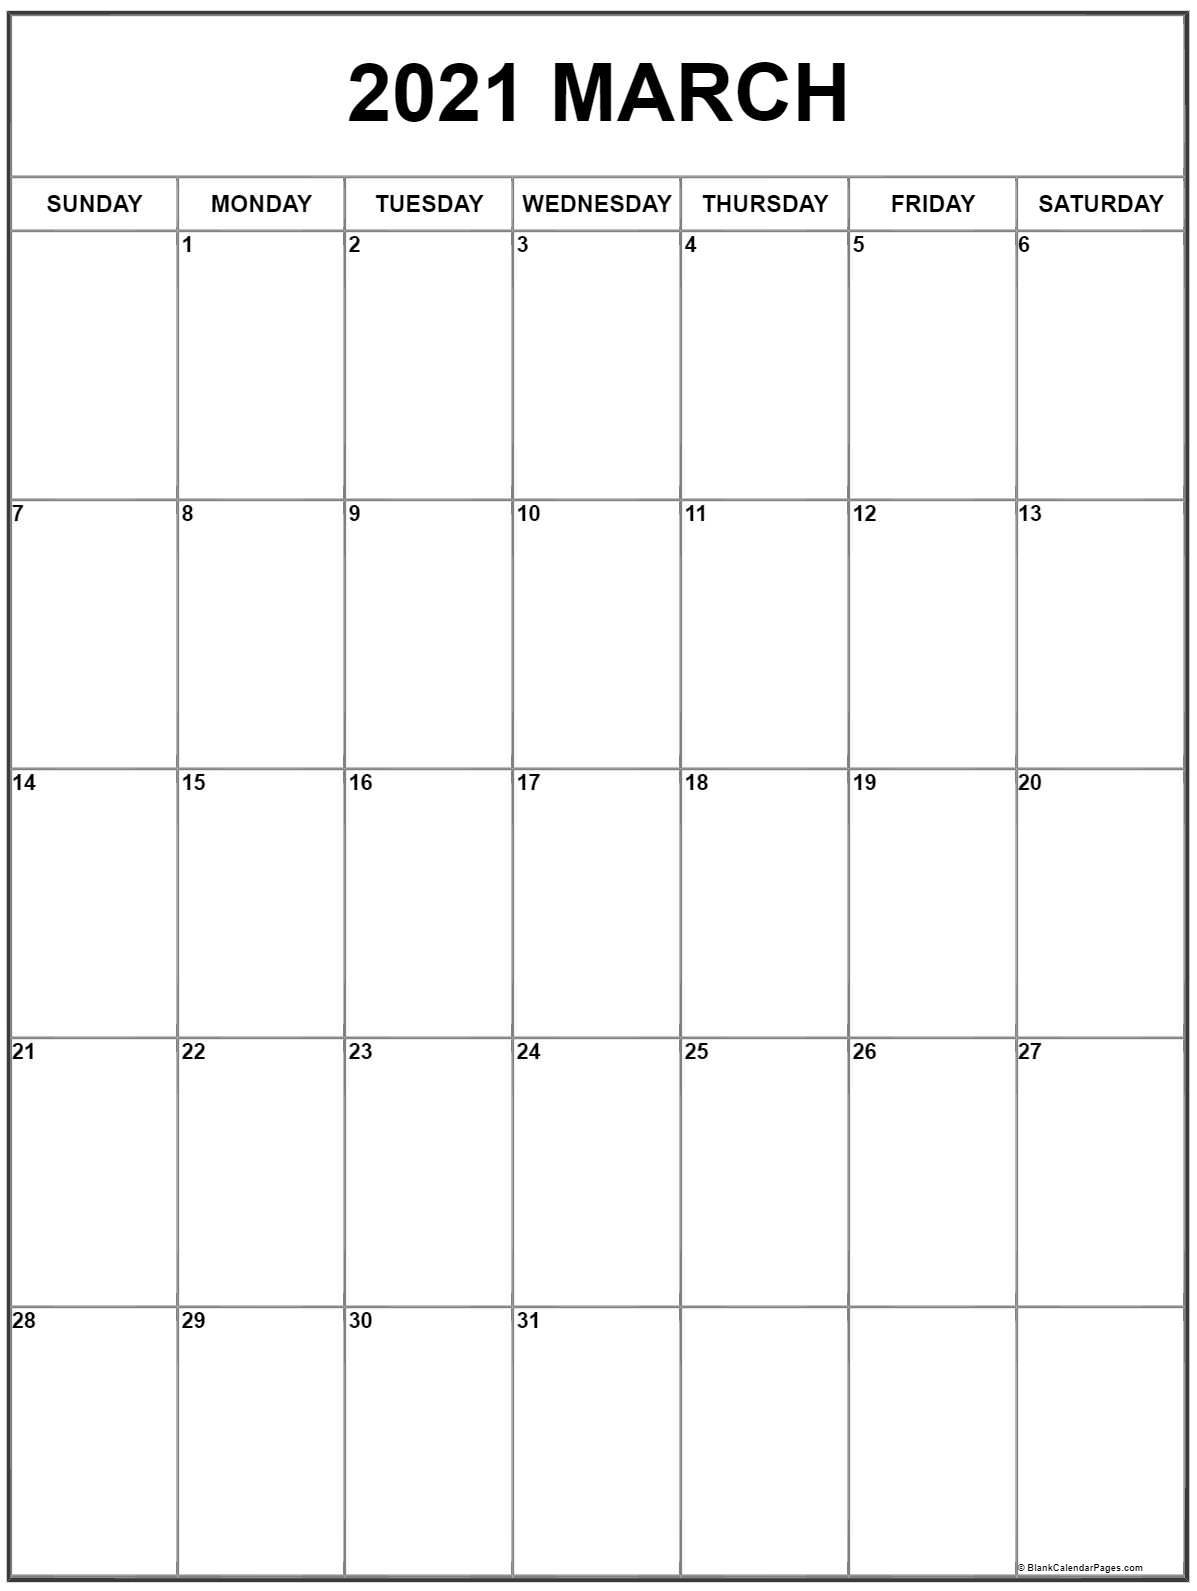 March 2021 Vertical Calendar | Portrait